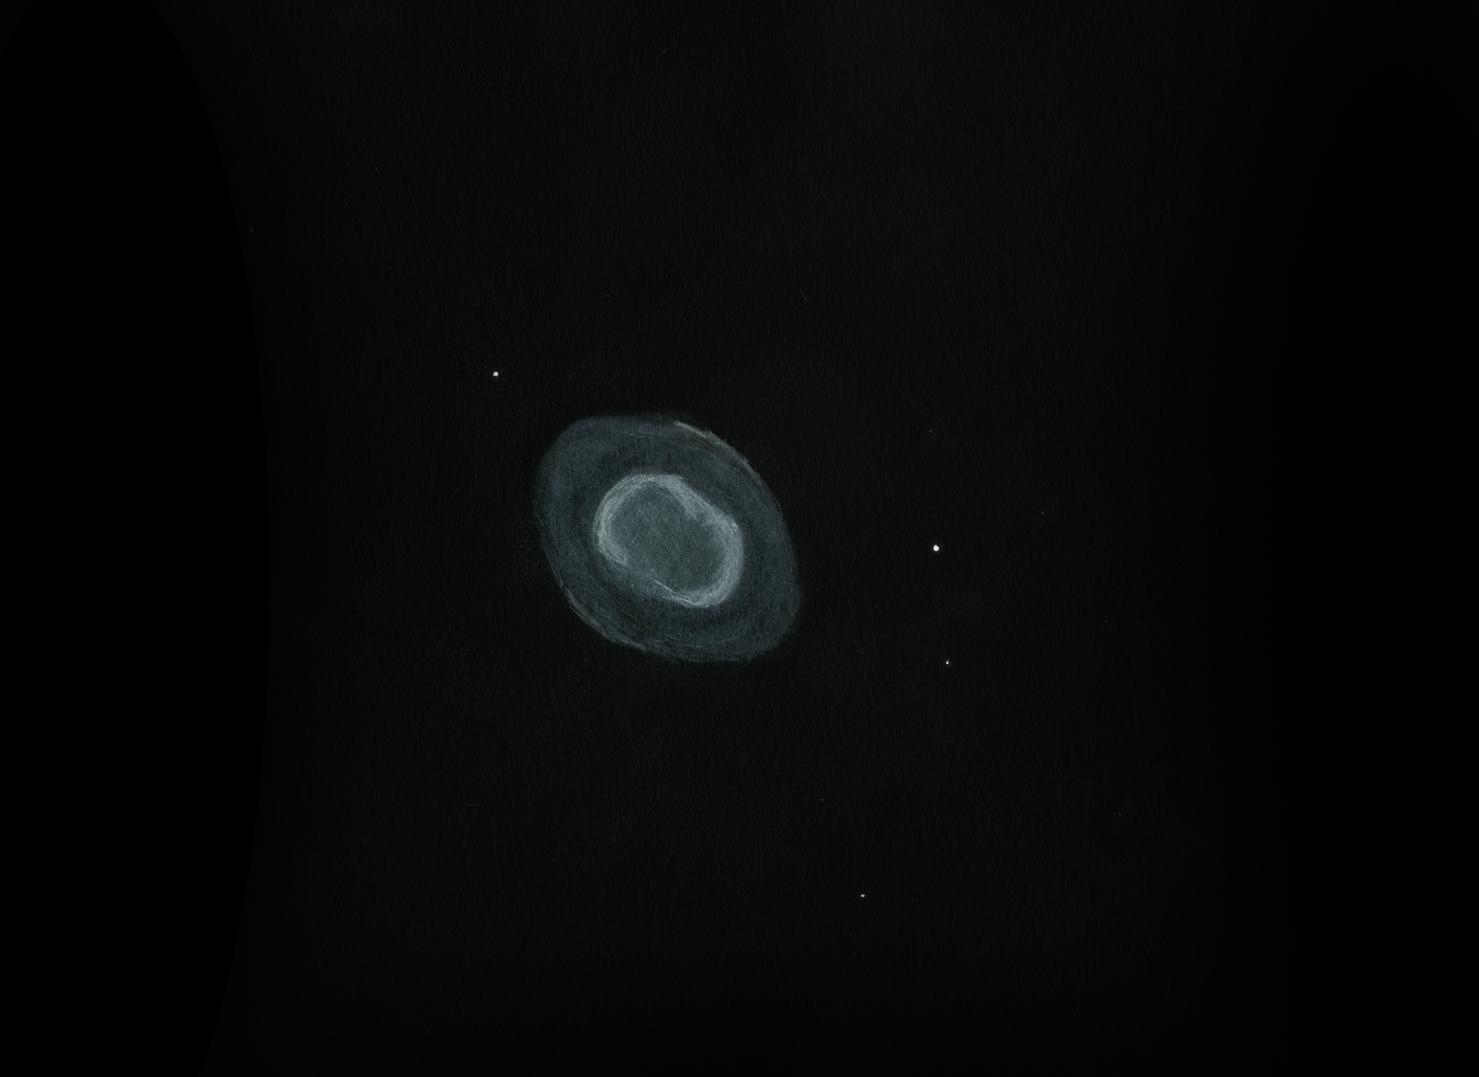 NGC_7662_2020-09-08_19-00_T400x742_gbe_small.png.78c1b1126c29261e11d68f92d48dc05e.png